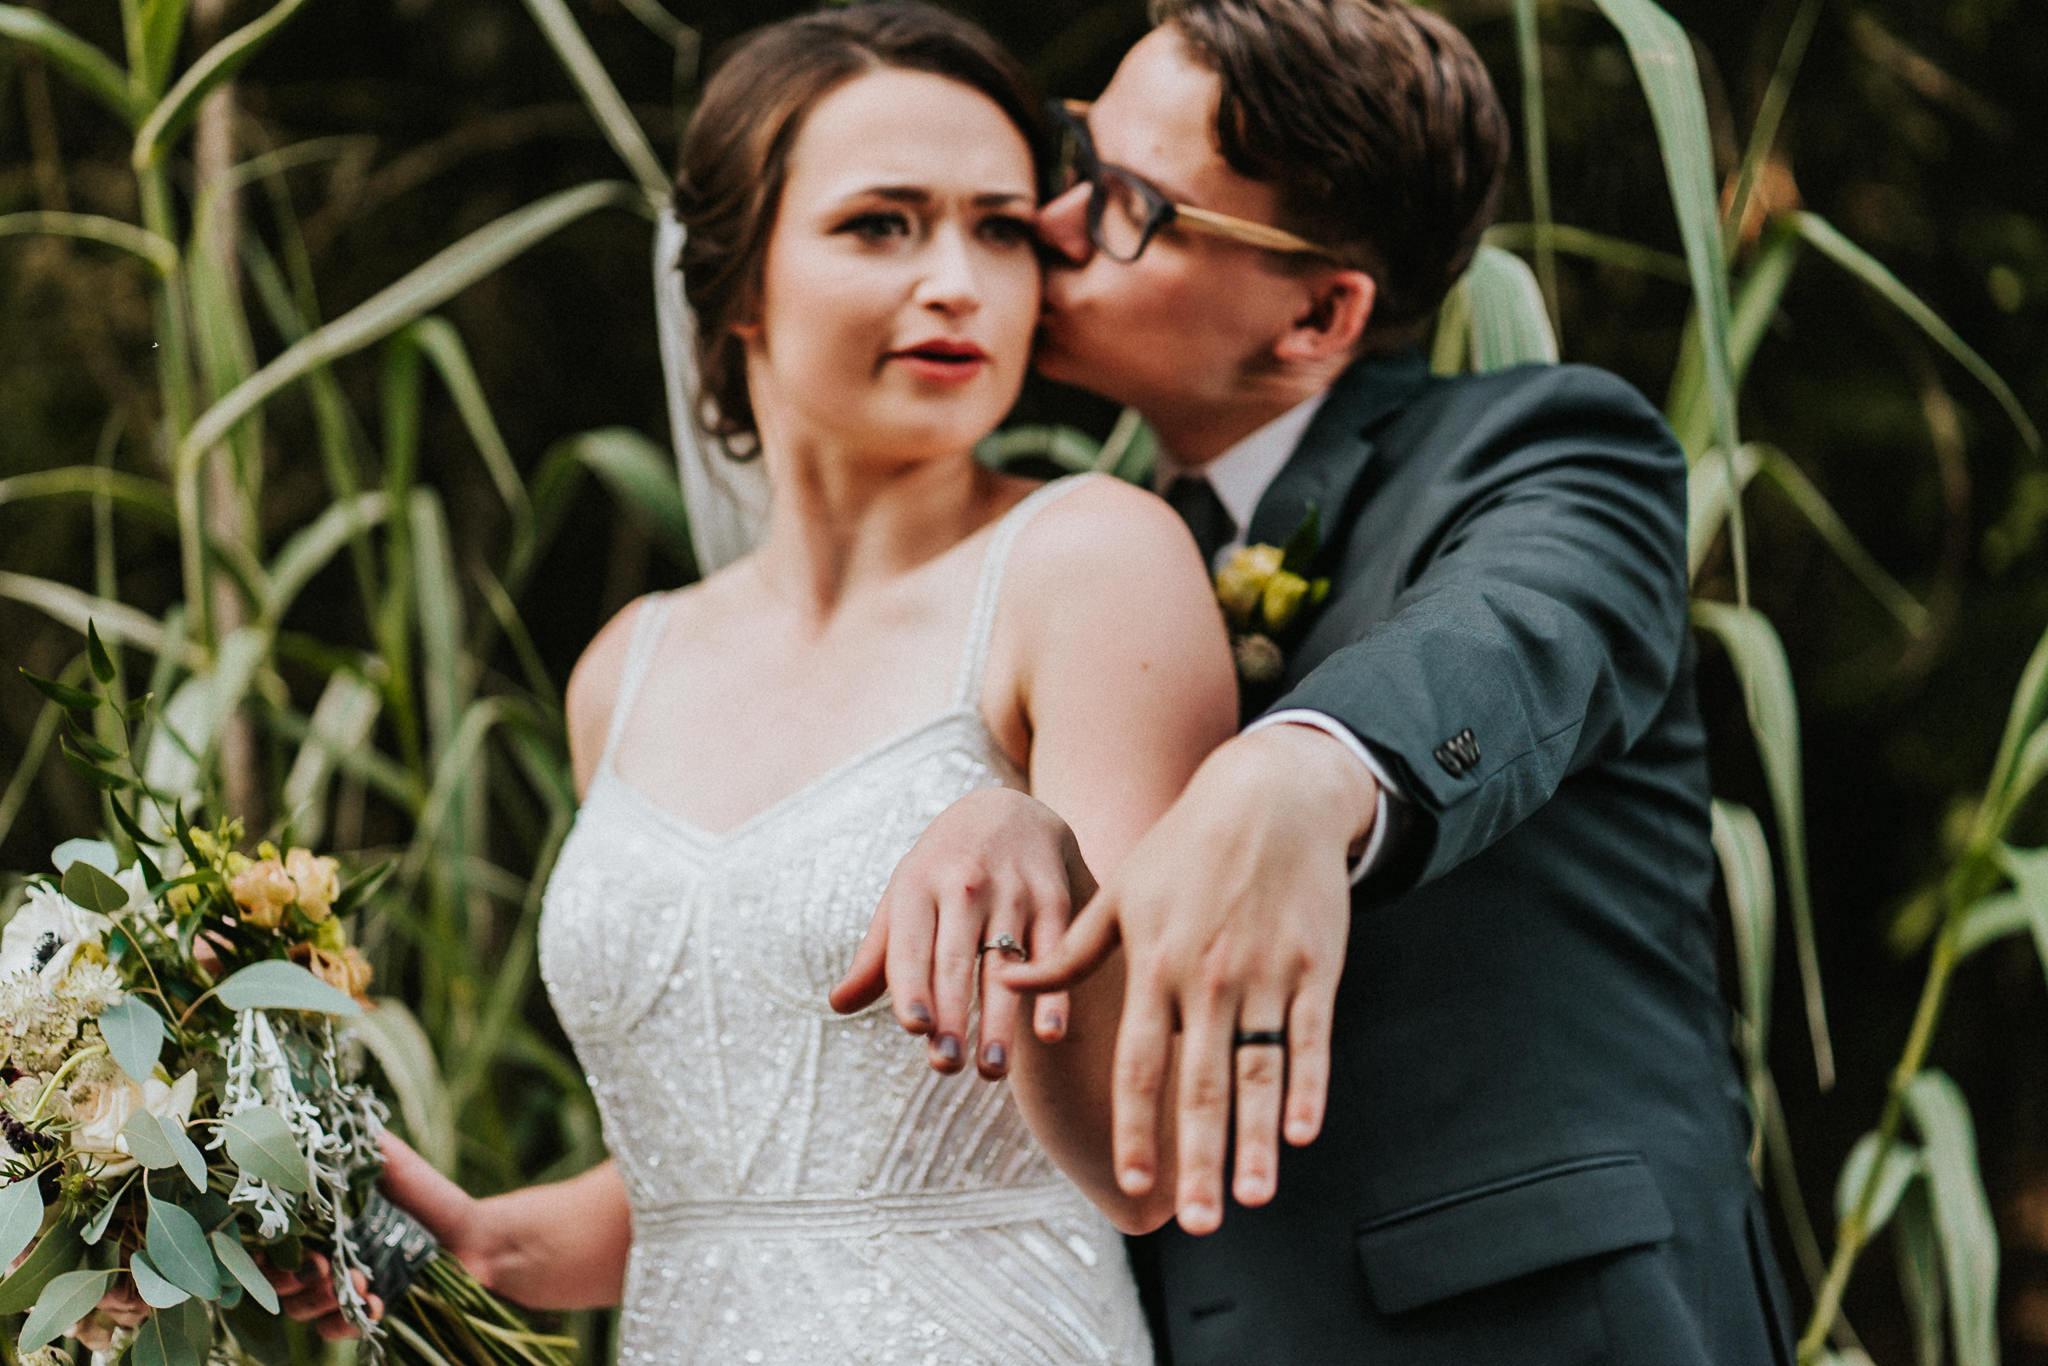 Show off wedding ring bride groom Portland Photography